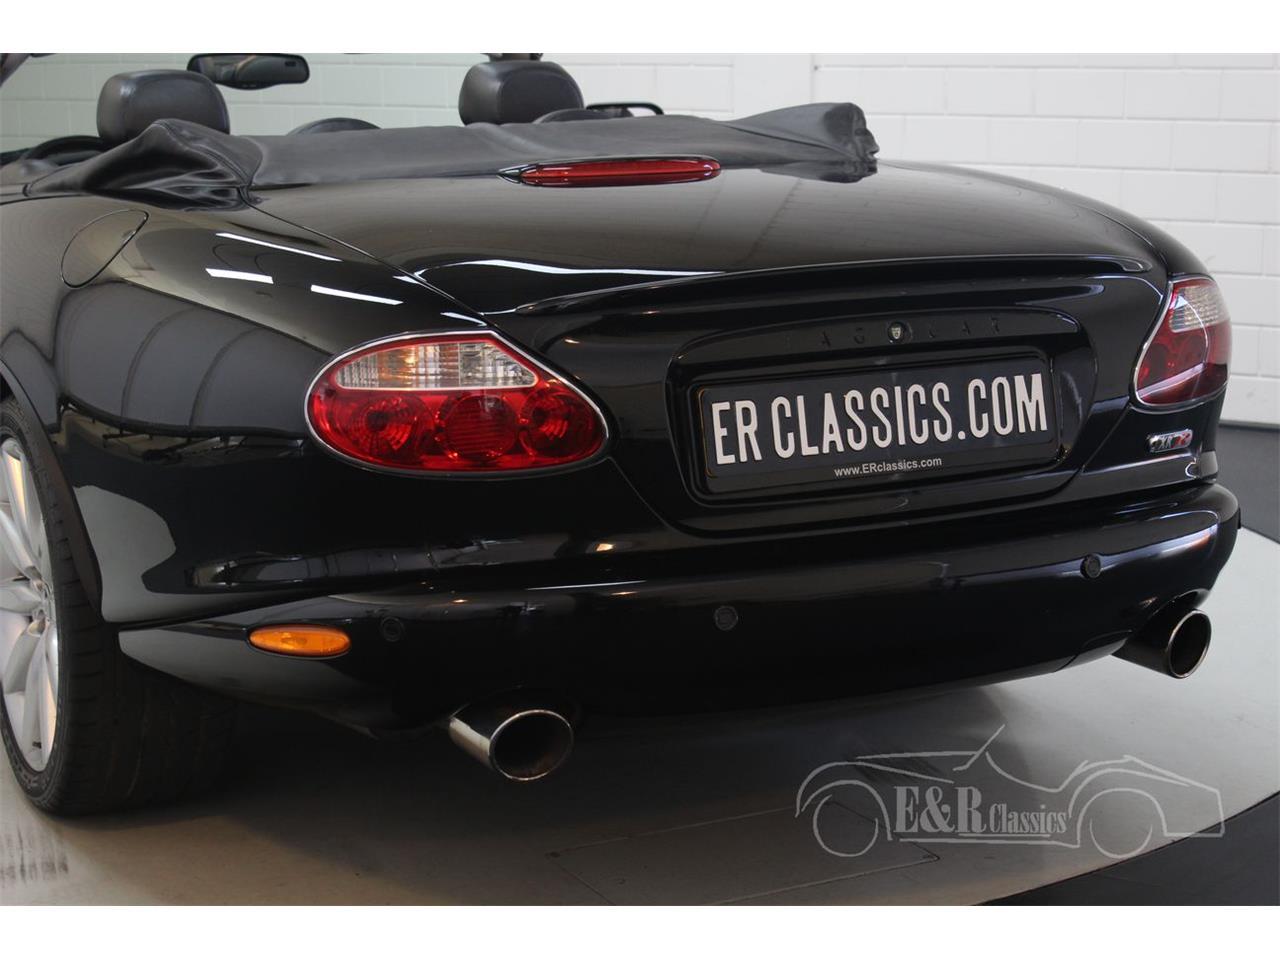 Large Picture of 2003 Jaguar XKR located in Waalwijk noord brabant - Q3GE